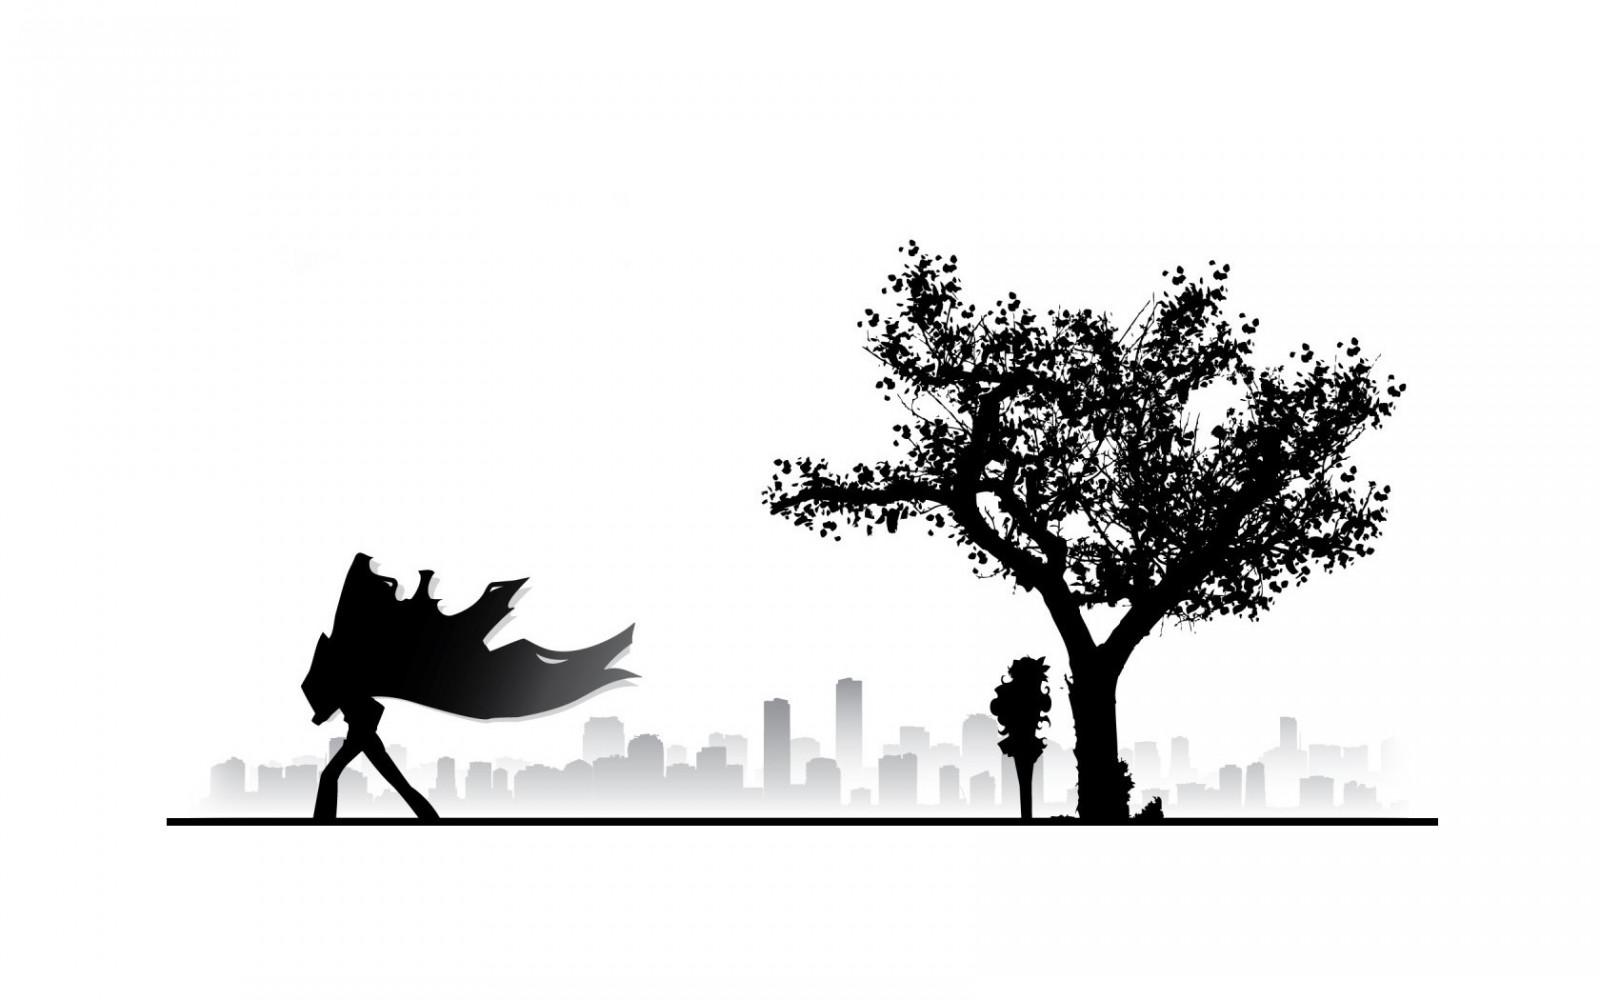 Wallpaper Ilustrasi Bayangan Hitam Logo Cabang Gambar